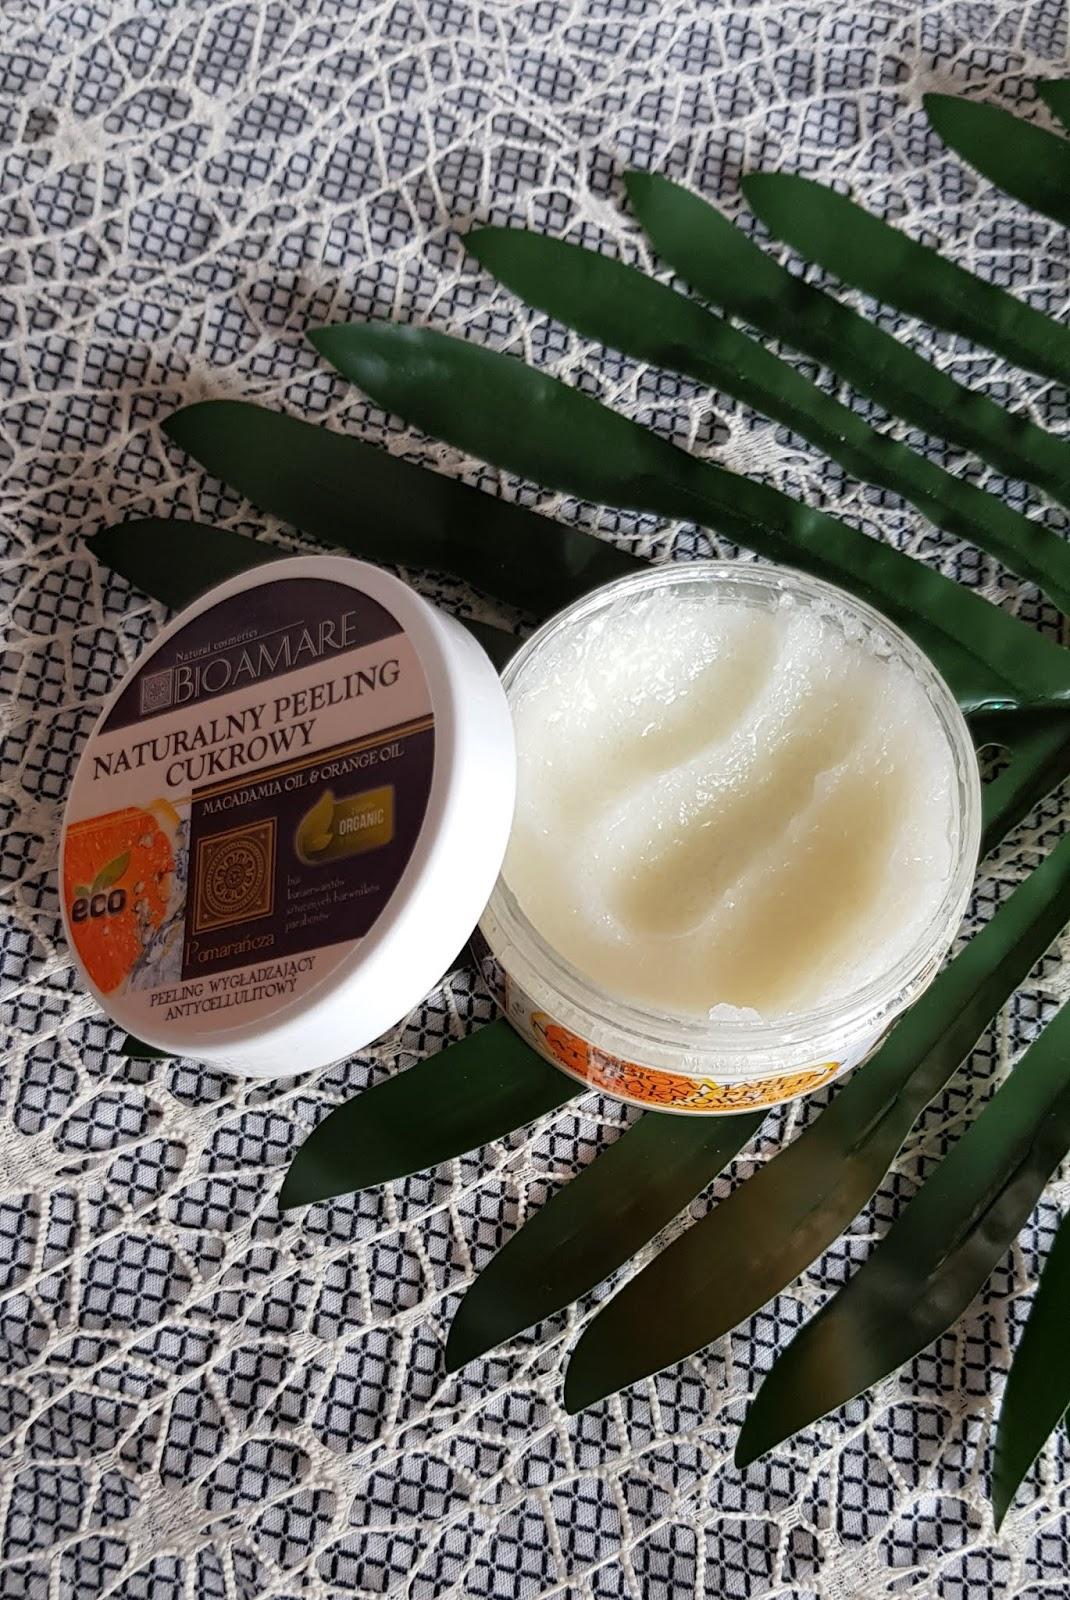 Bioamare naturalny peeling cukrowy pomarańcza